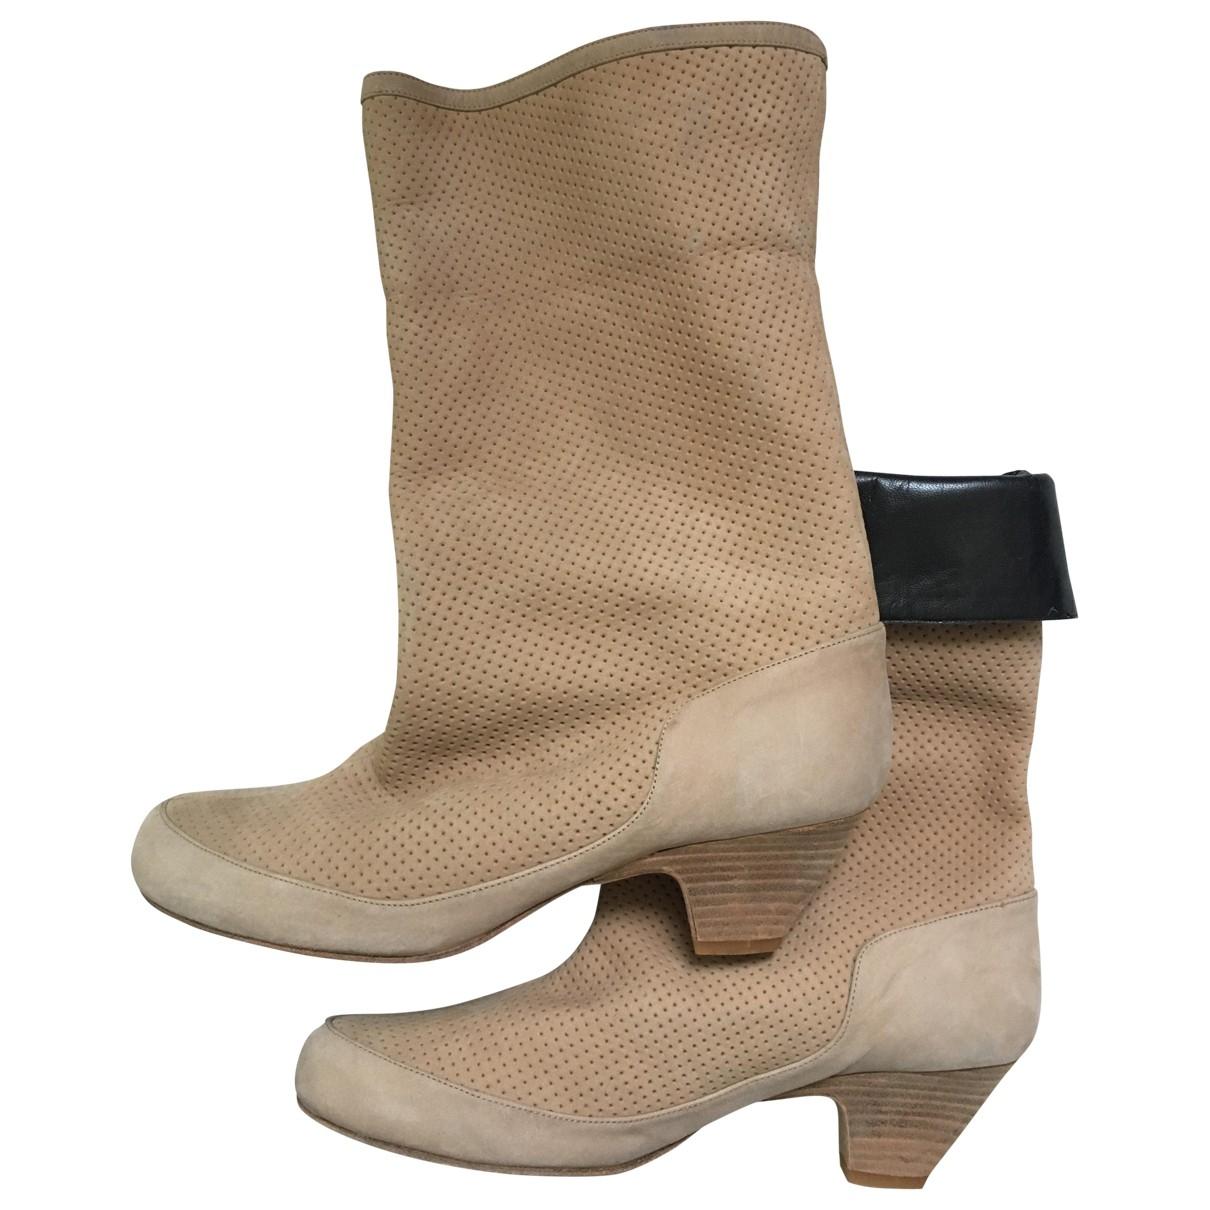 Karine Arabian \N Beige Suede Ankle boots for Women 38 EU